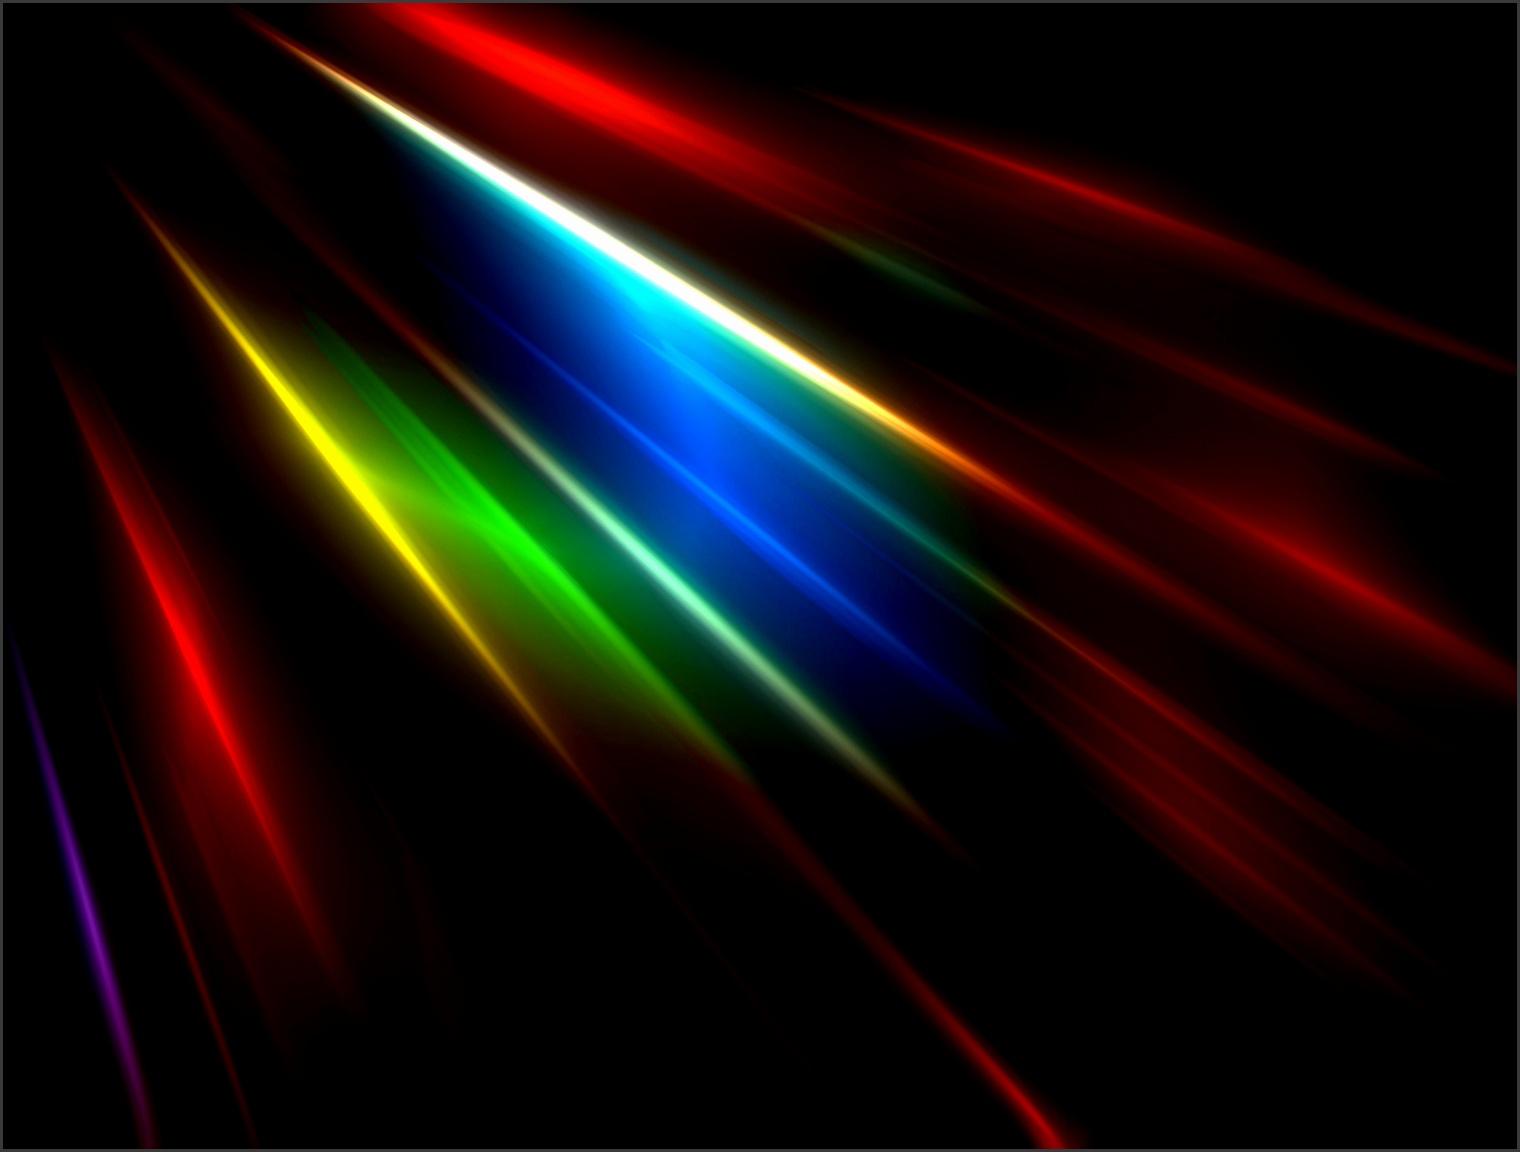 7 Neon Powerpoint Templates SampleTemplatess SampleTemplatess